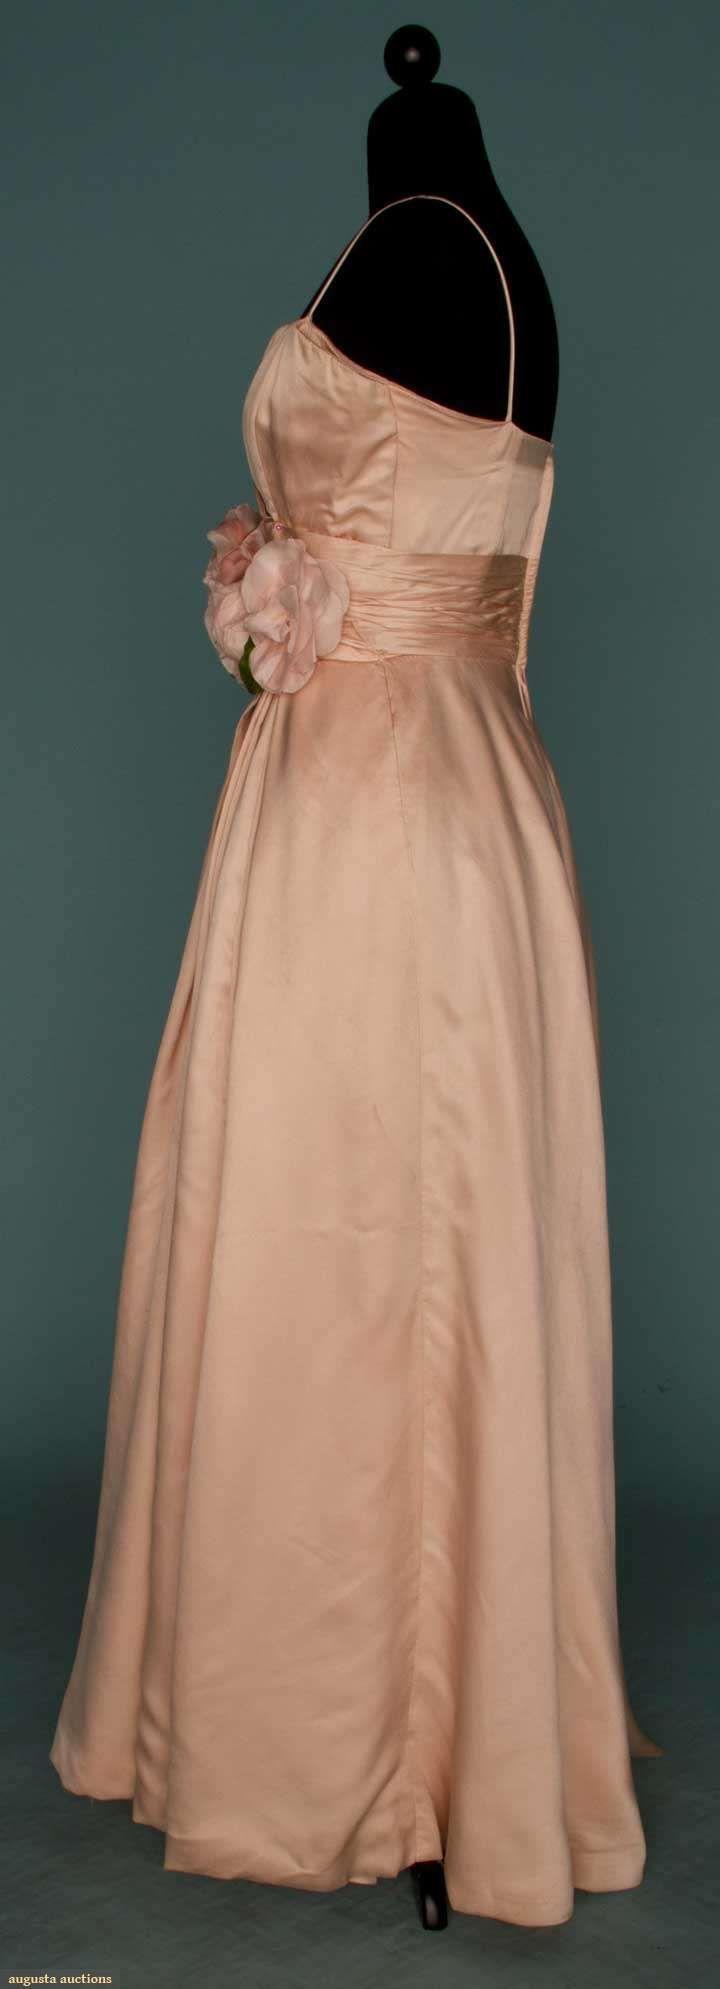 Pink satin ballgown s spaghetti straps fitted bodice wide